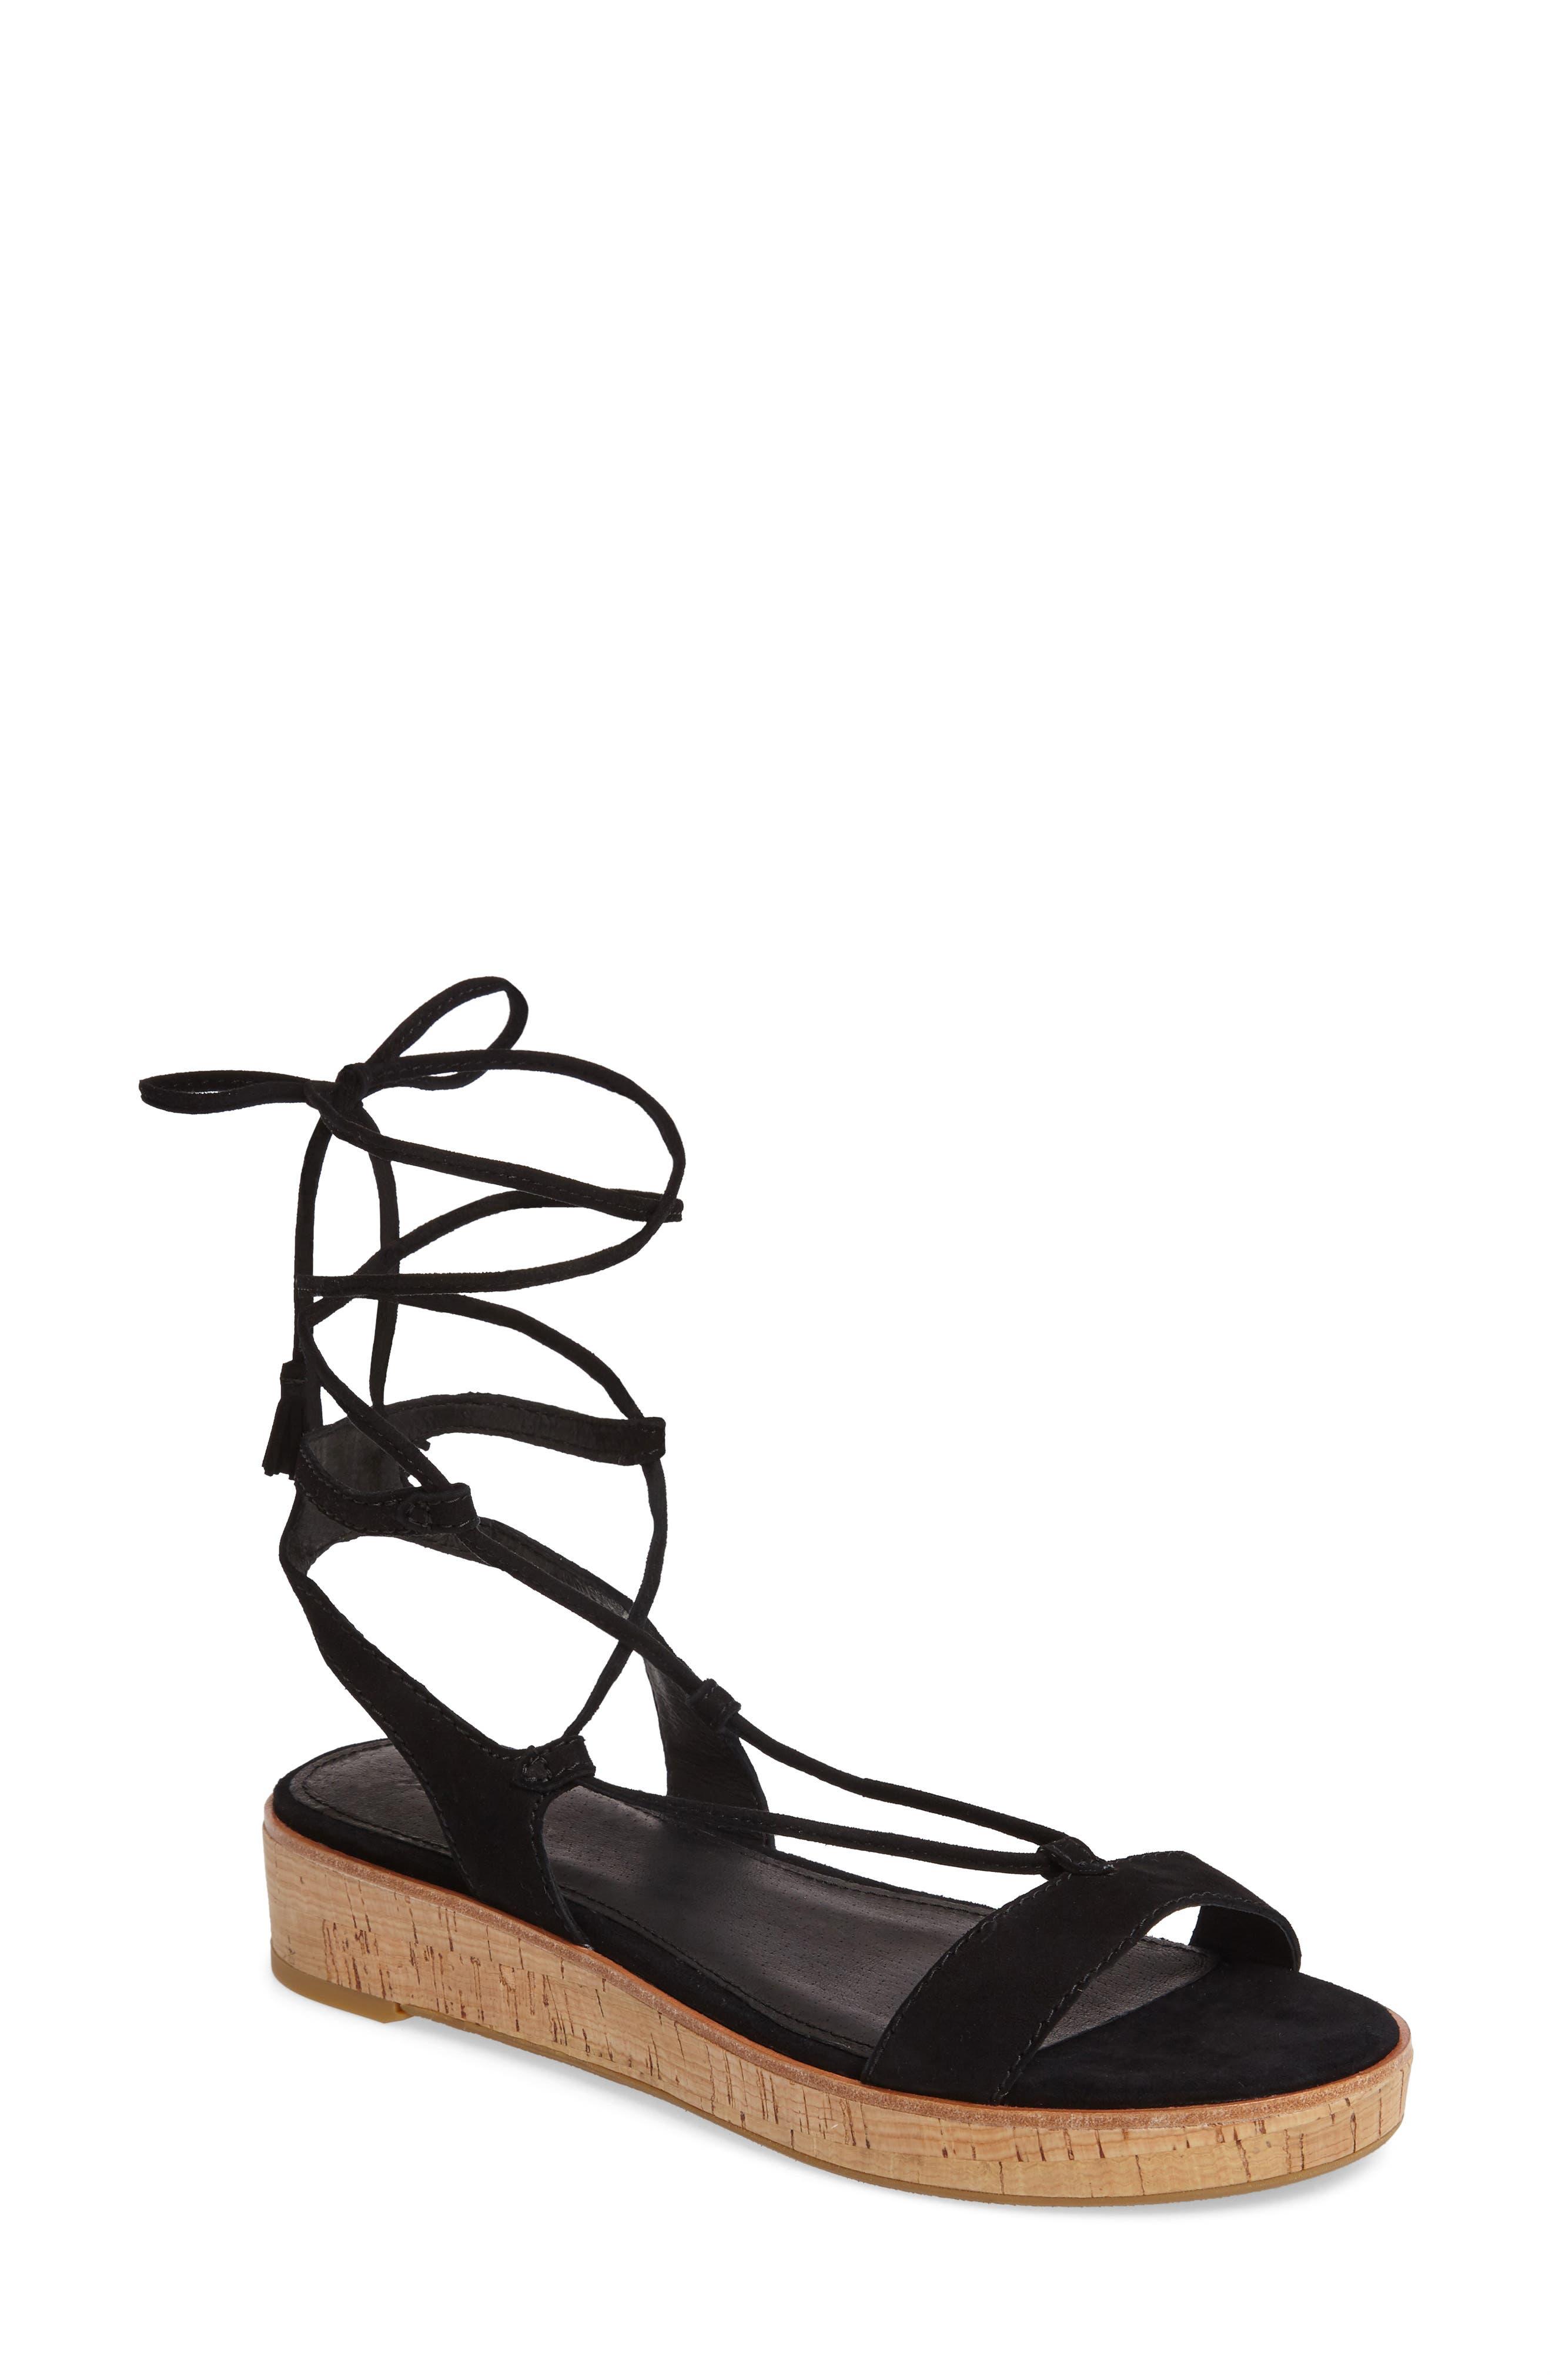 Miranda Gladiator Platform Sandal,                             Main thumbnail 1, color,                             Black Suede